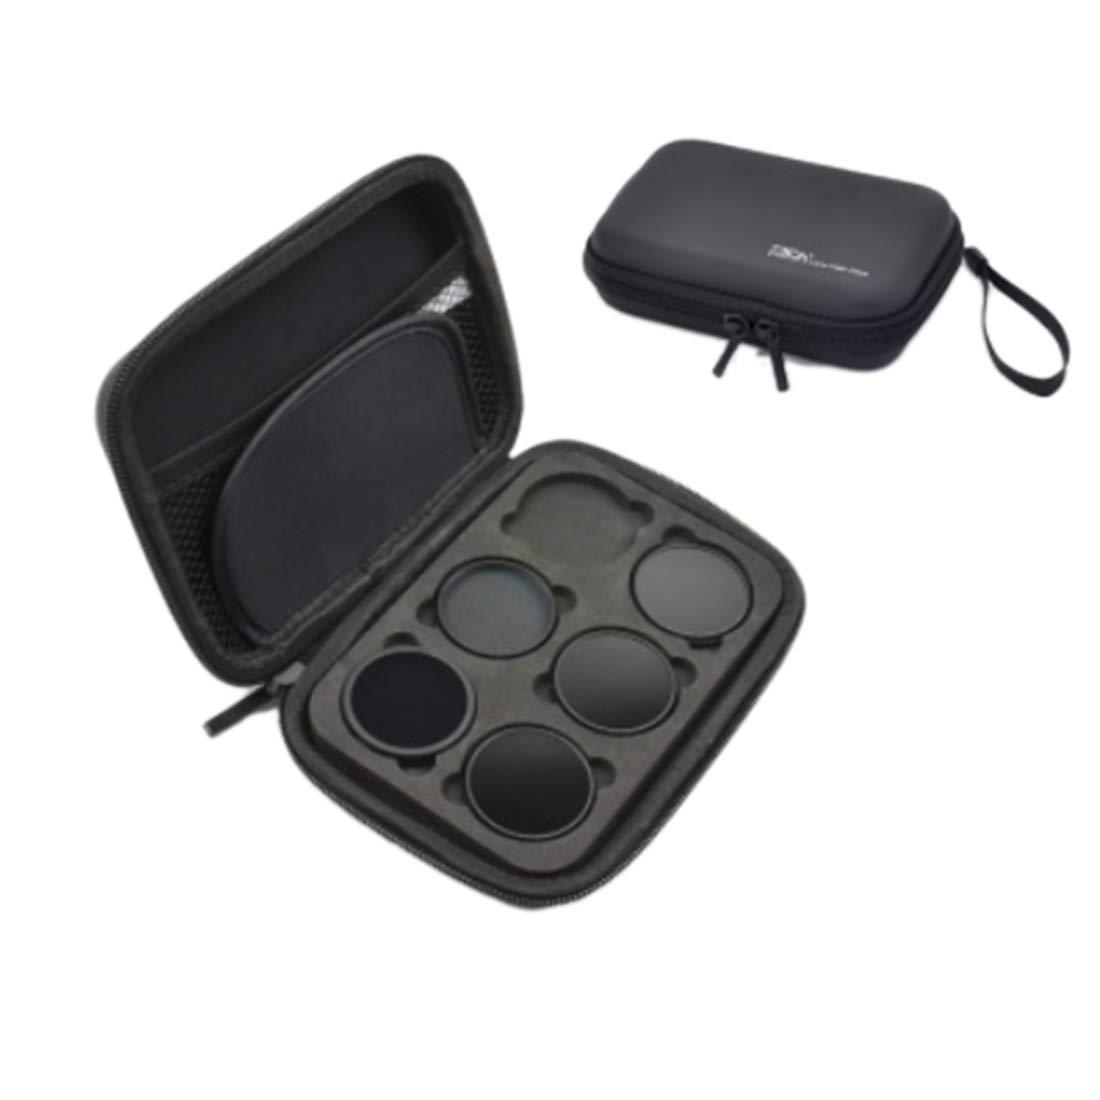 YUKIKO YUKIKO YUKIKO PGYTECH Objektiv Filter Set (MC-UV ND4 ND8 ND16 CPL Filter) für DJI OSMO X3 / Inspire 1 Drohne Teile Zubehör mit Kameratasche 1db5d4